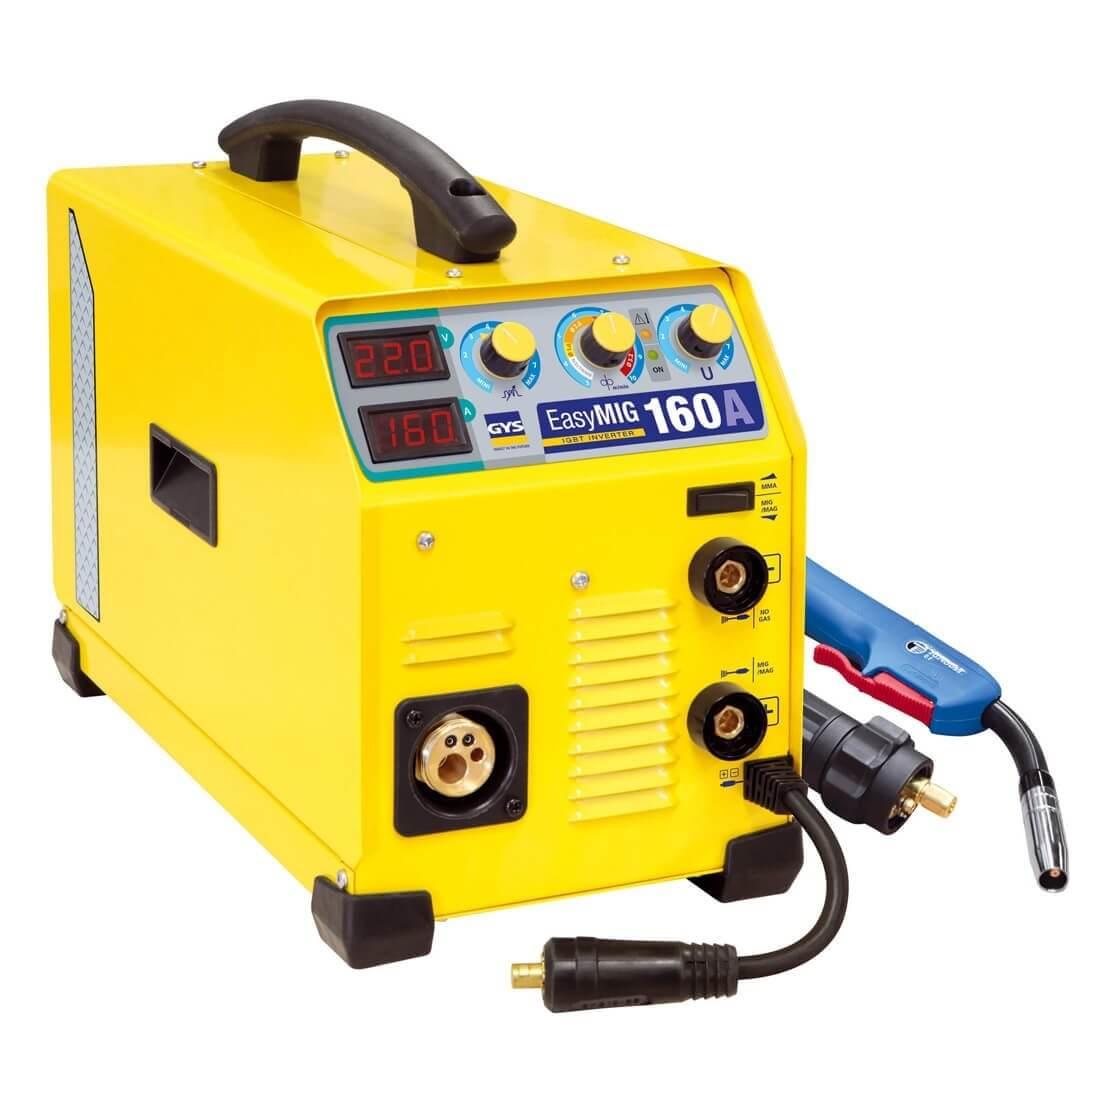 Poste de soudure MIG EASYMIG 160 -160A 230V - 3 EN1  - GYS